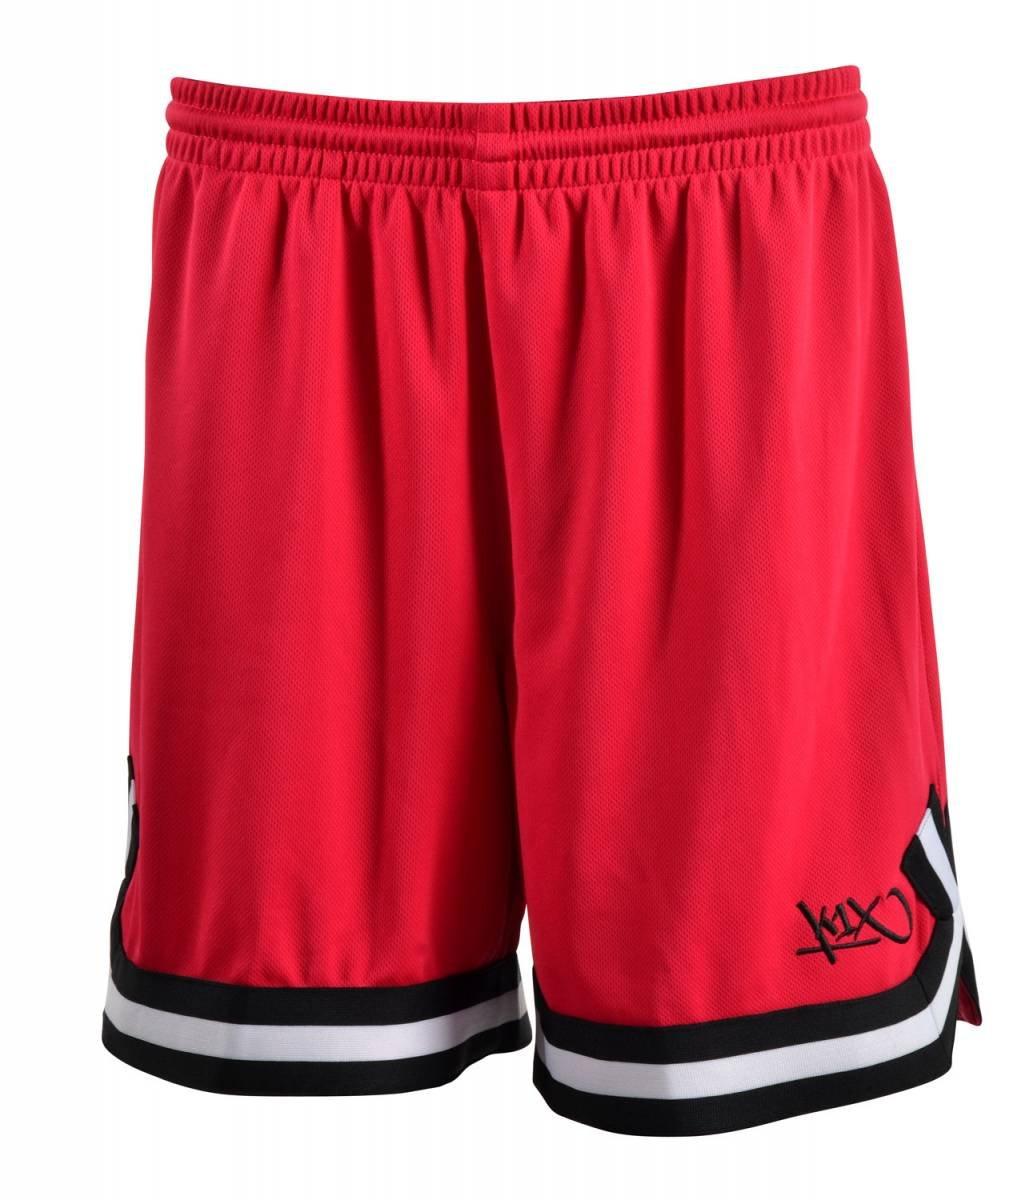 k1x wmns k1x hardwood ladies double x shorts